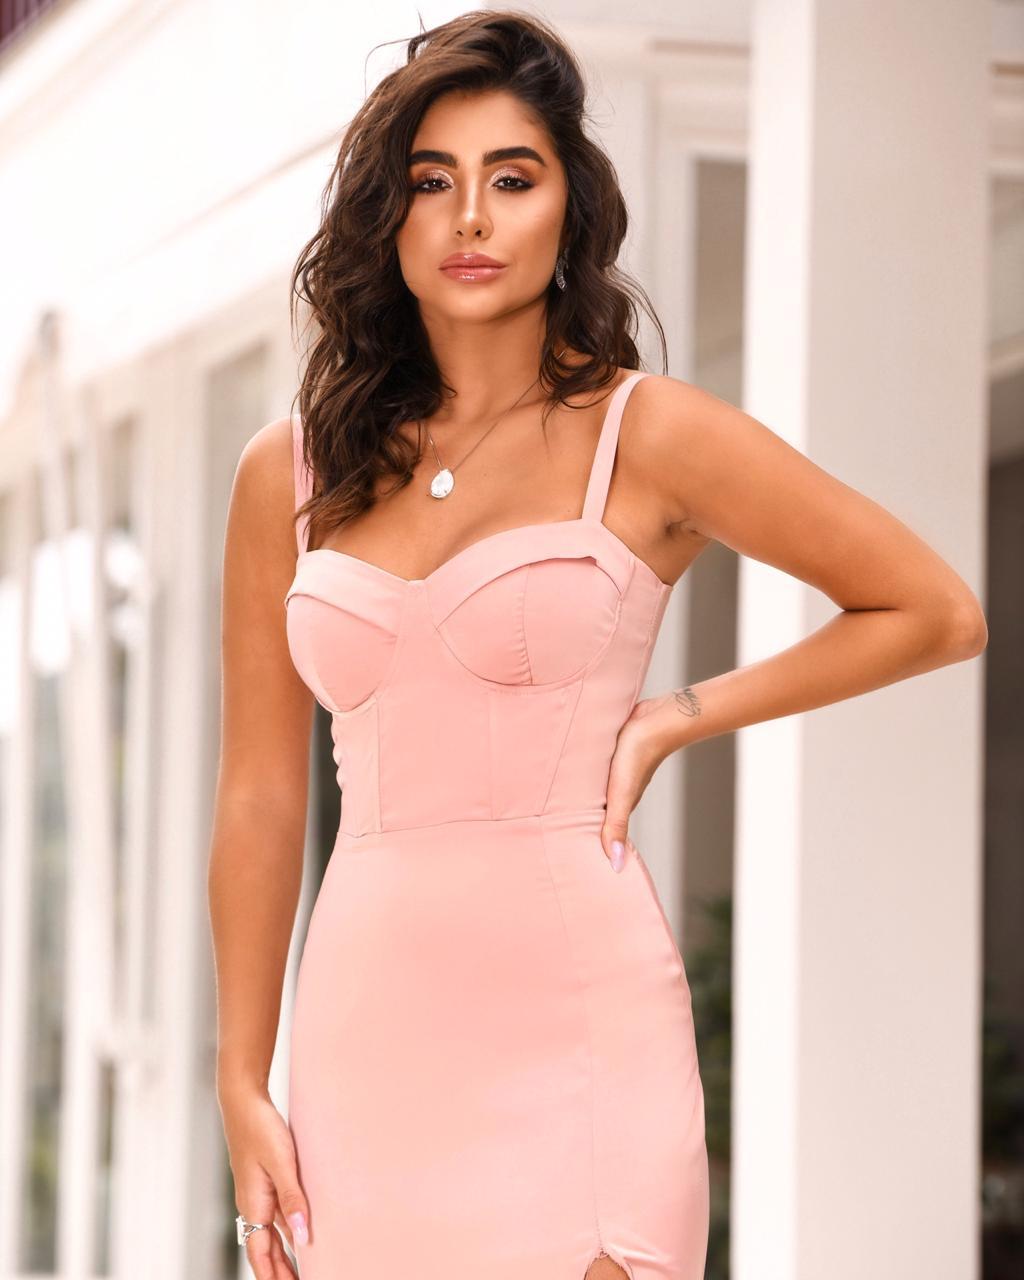 Vestido Ana Carla  - Empório NM